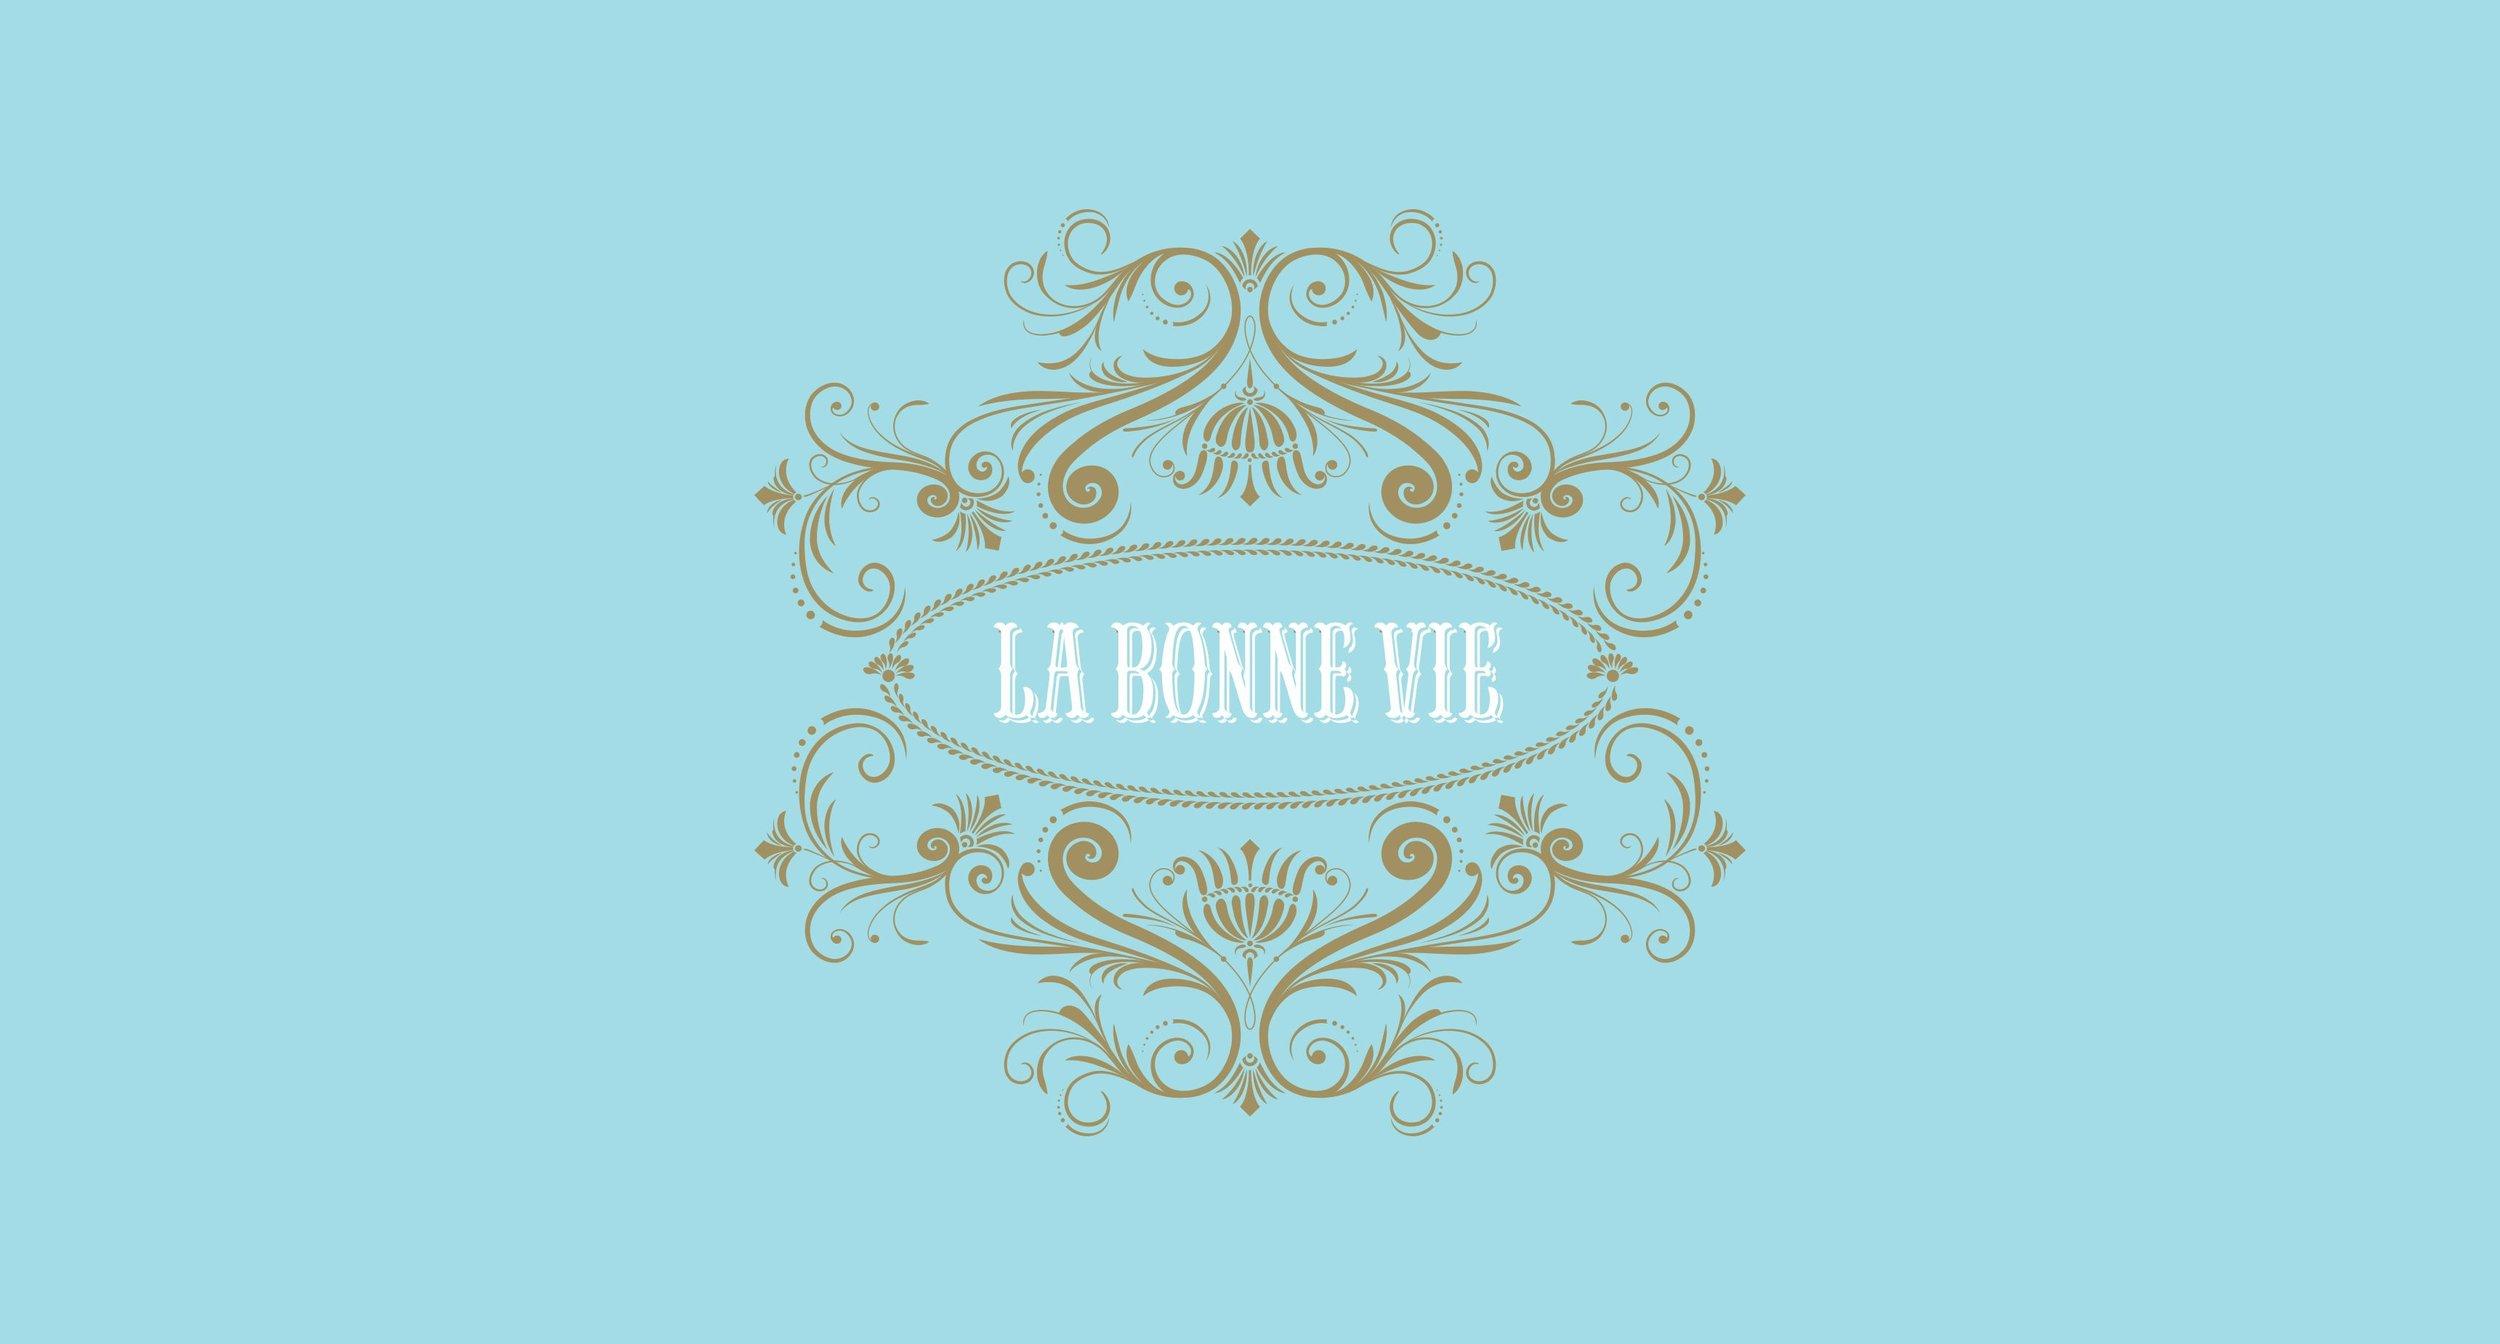 La Bonne Vie in White Logo - Blue Background